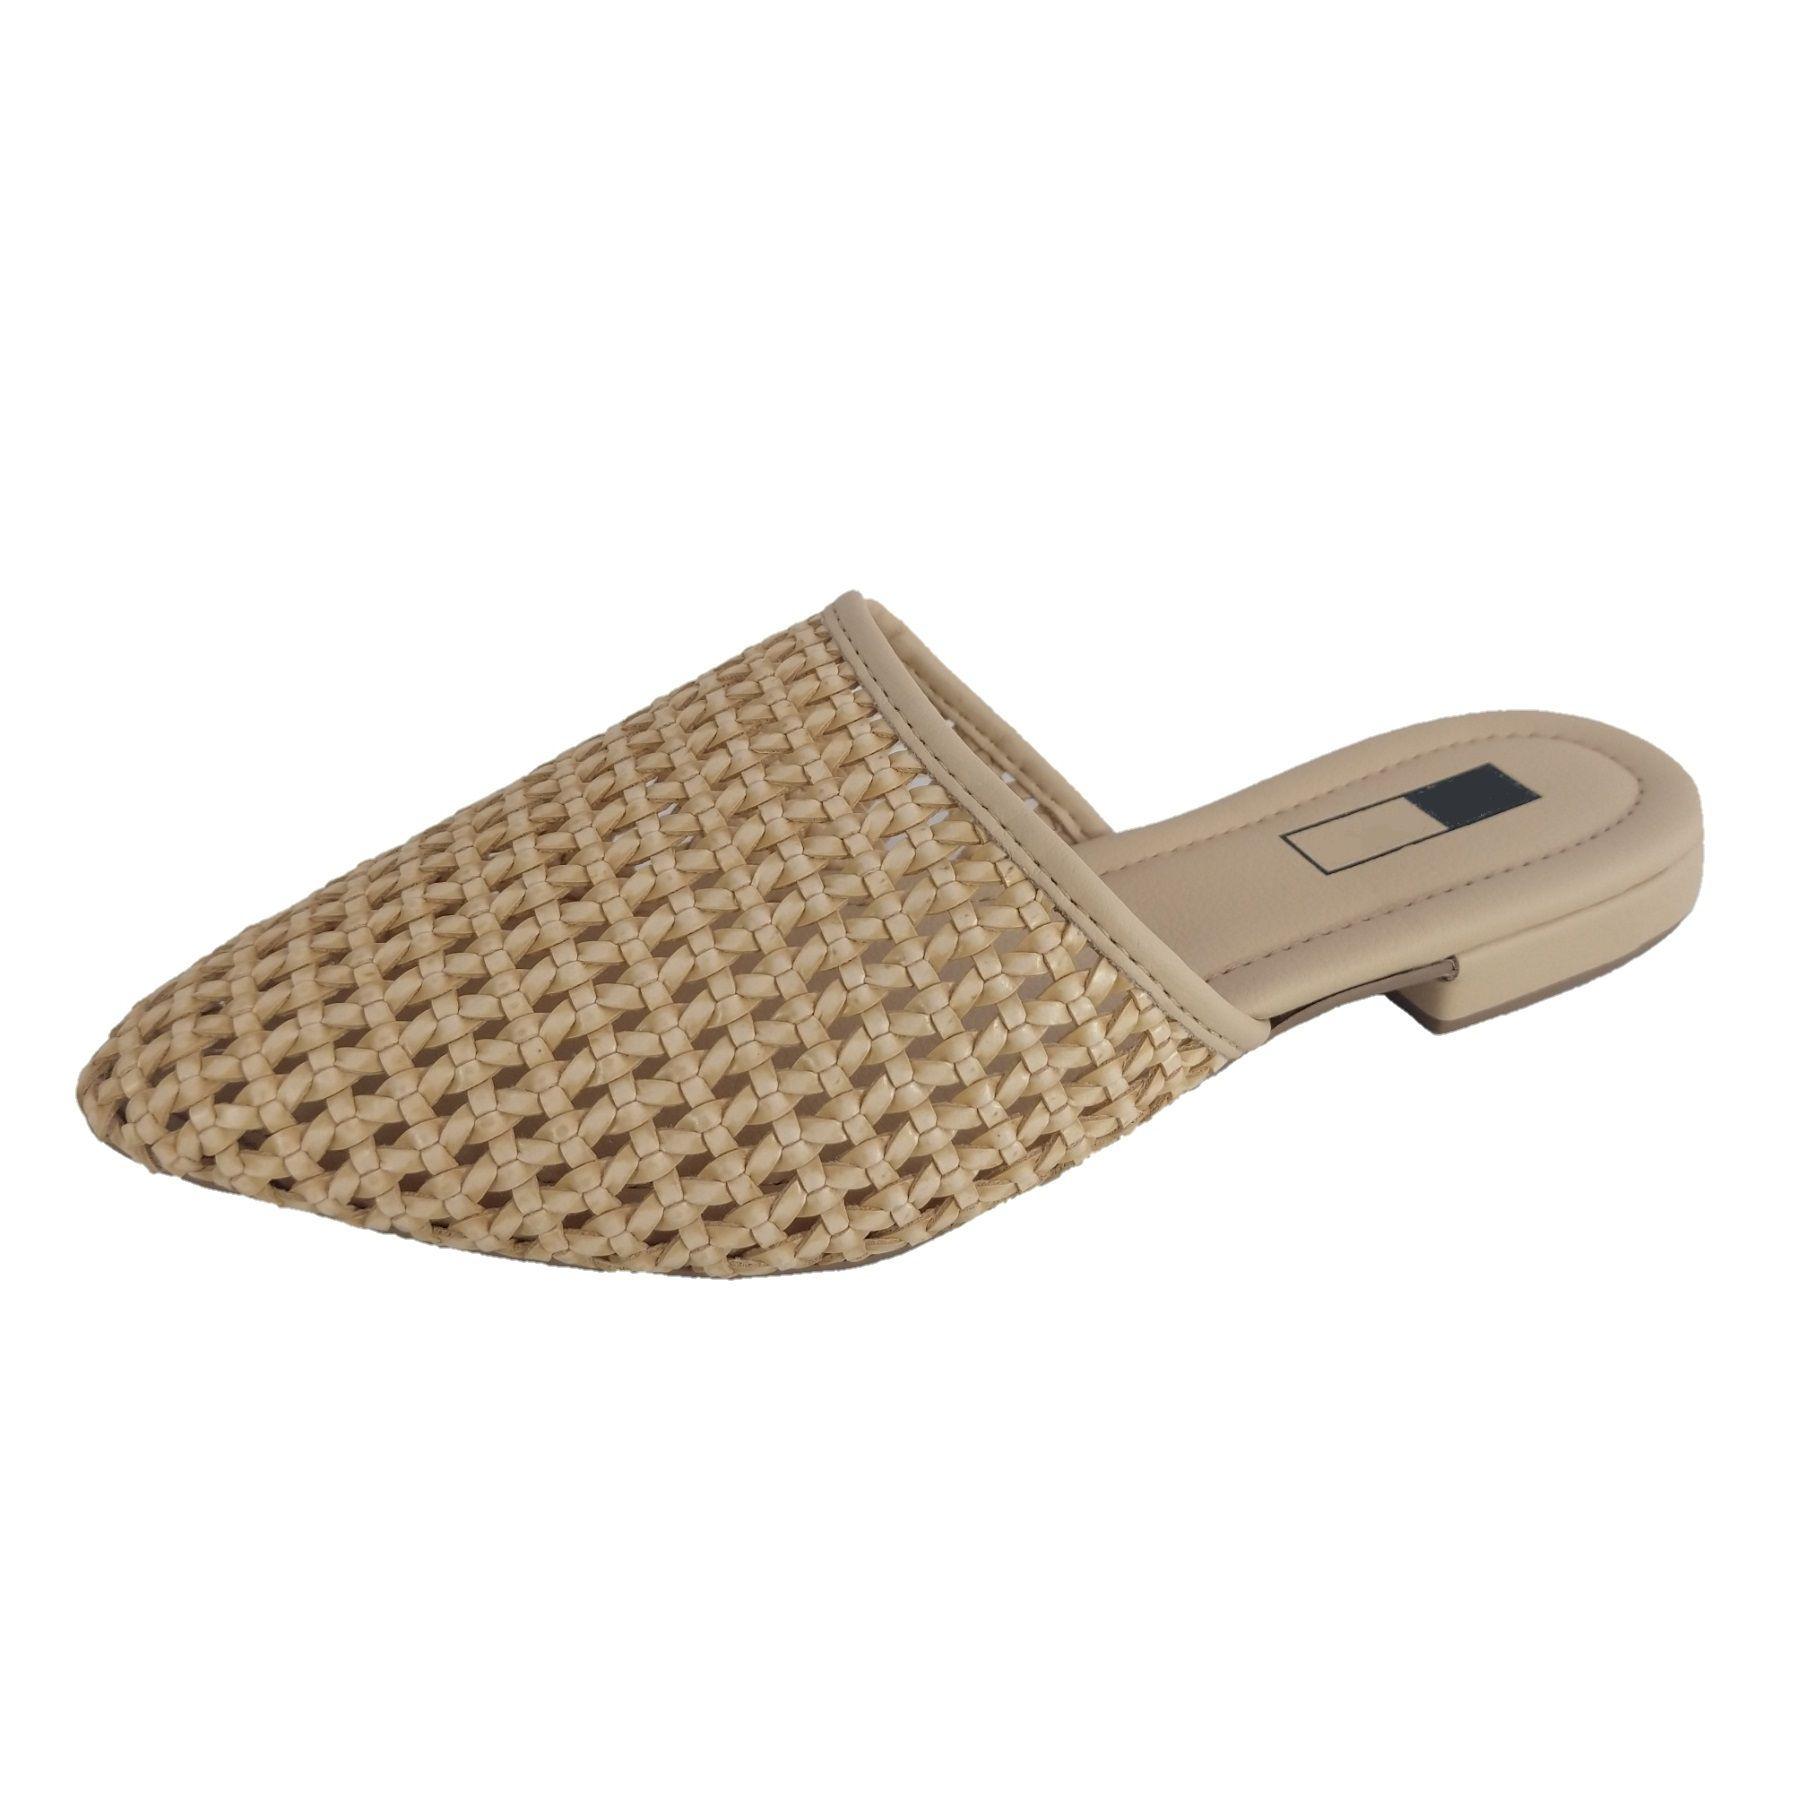 Mule Slipper SapatoWeb Tranças Bege  - SAPATOWEB.COM